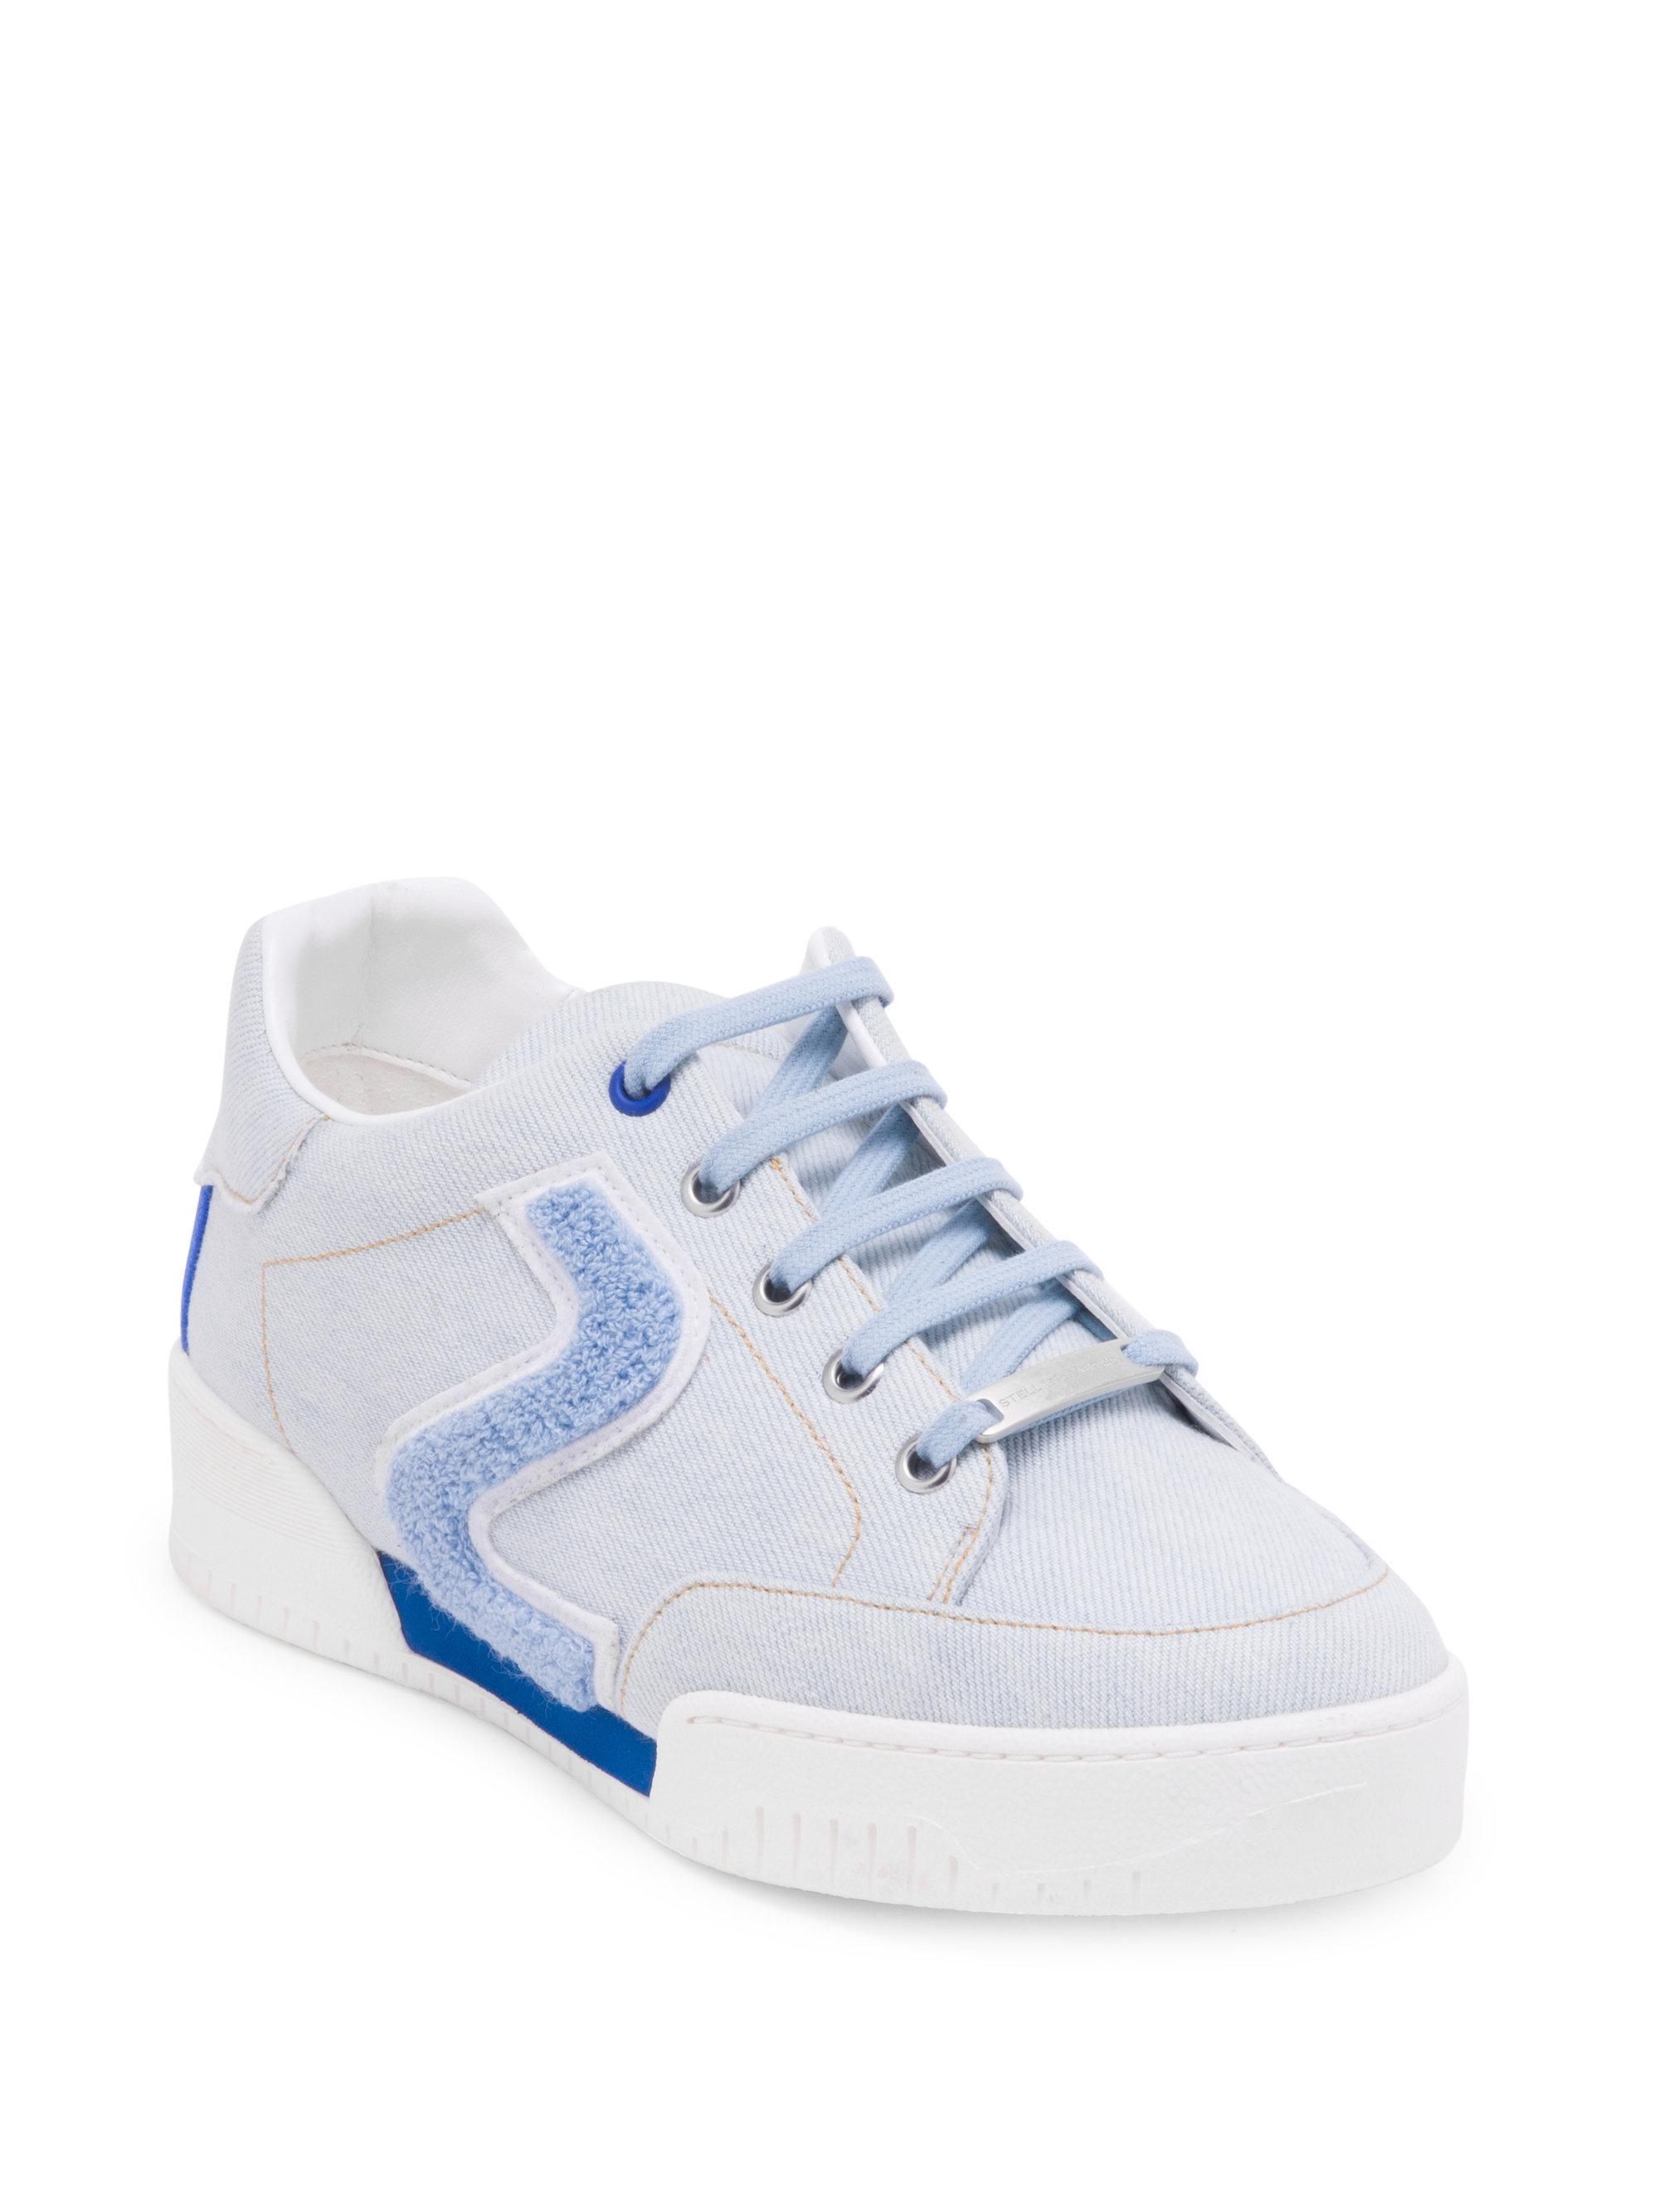 Stella McCartney Vintage Sneakers RE9MzPv